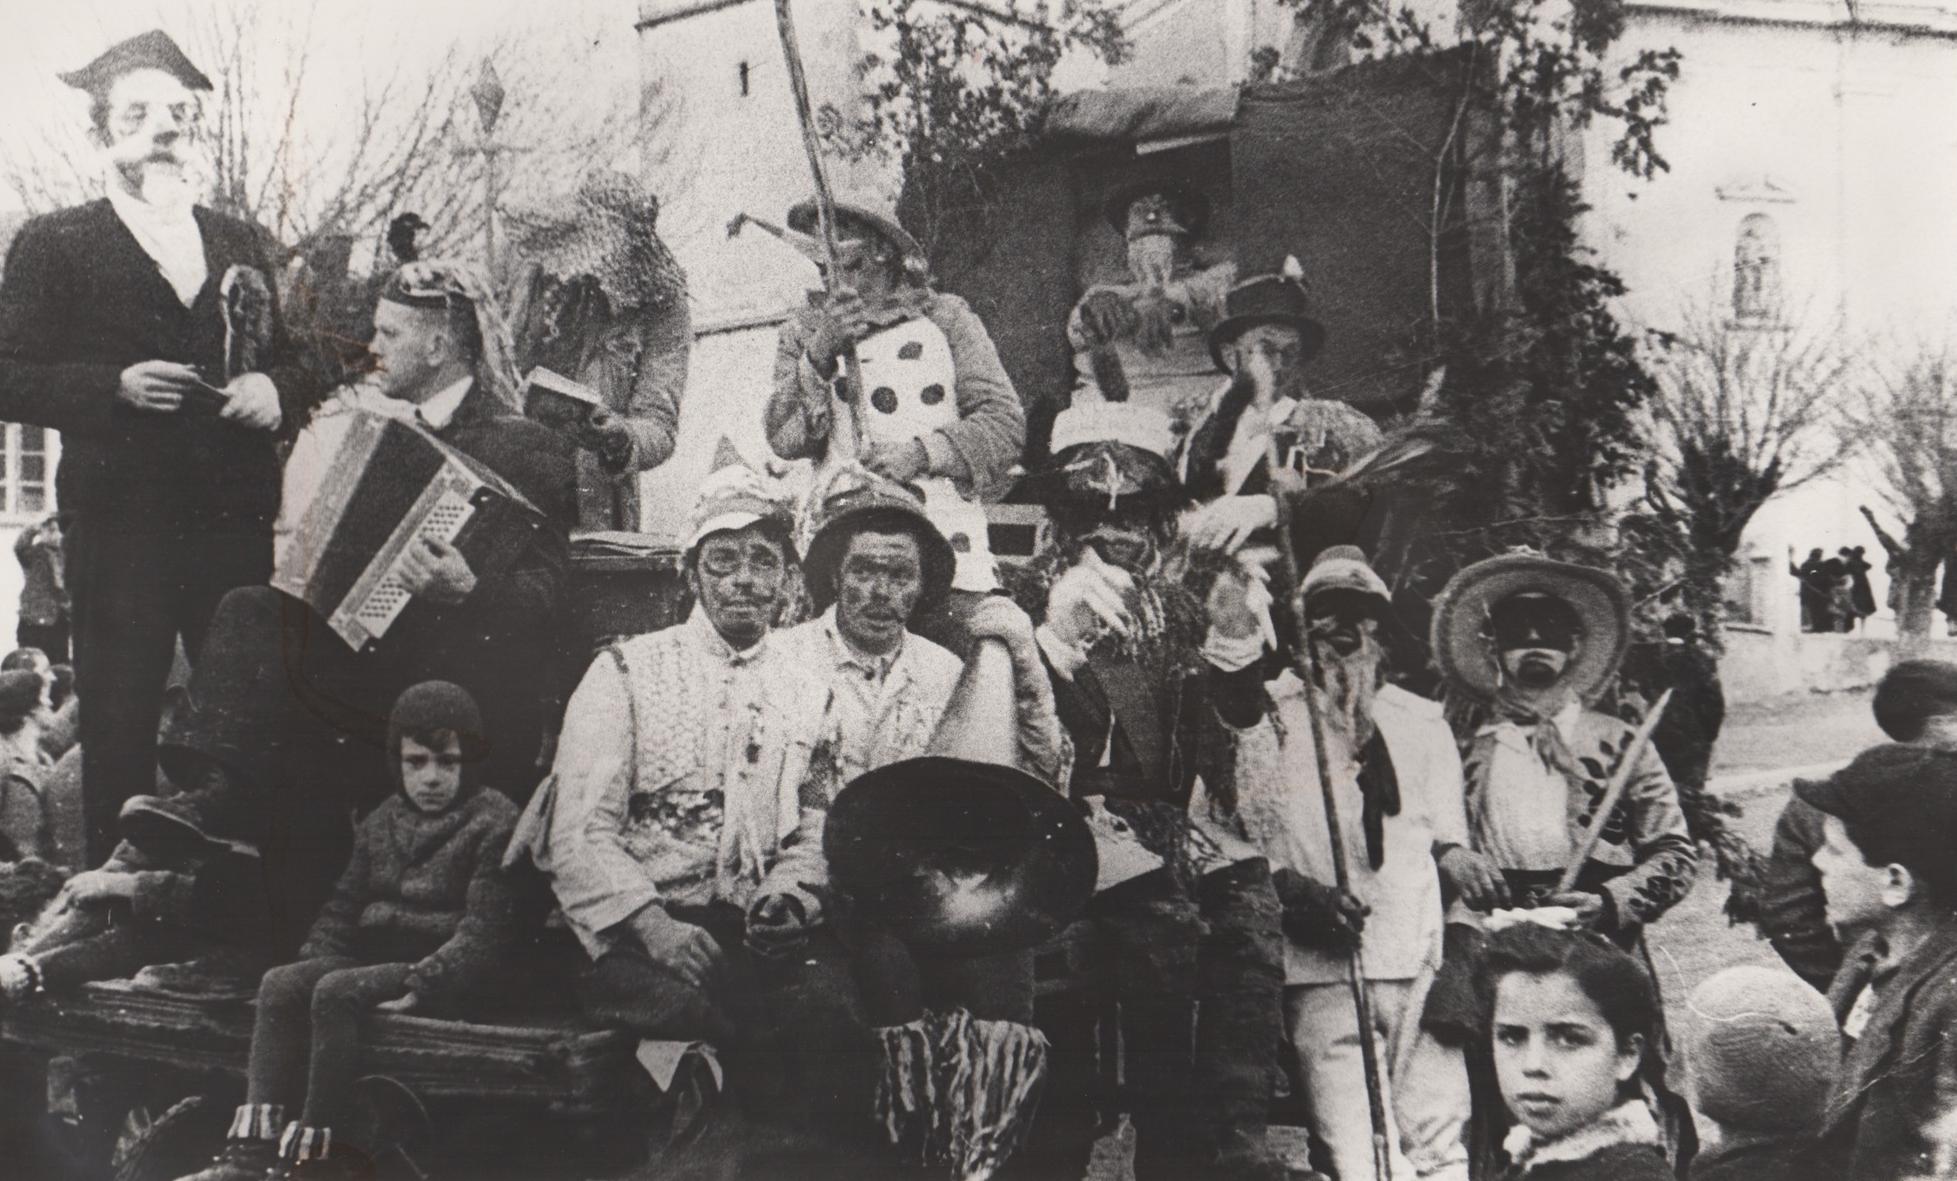 Maschggra am Kirchplatz in Salurn 1947 Carnevale in Piazza della Chiesa a Salorno 1947